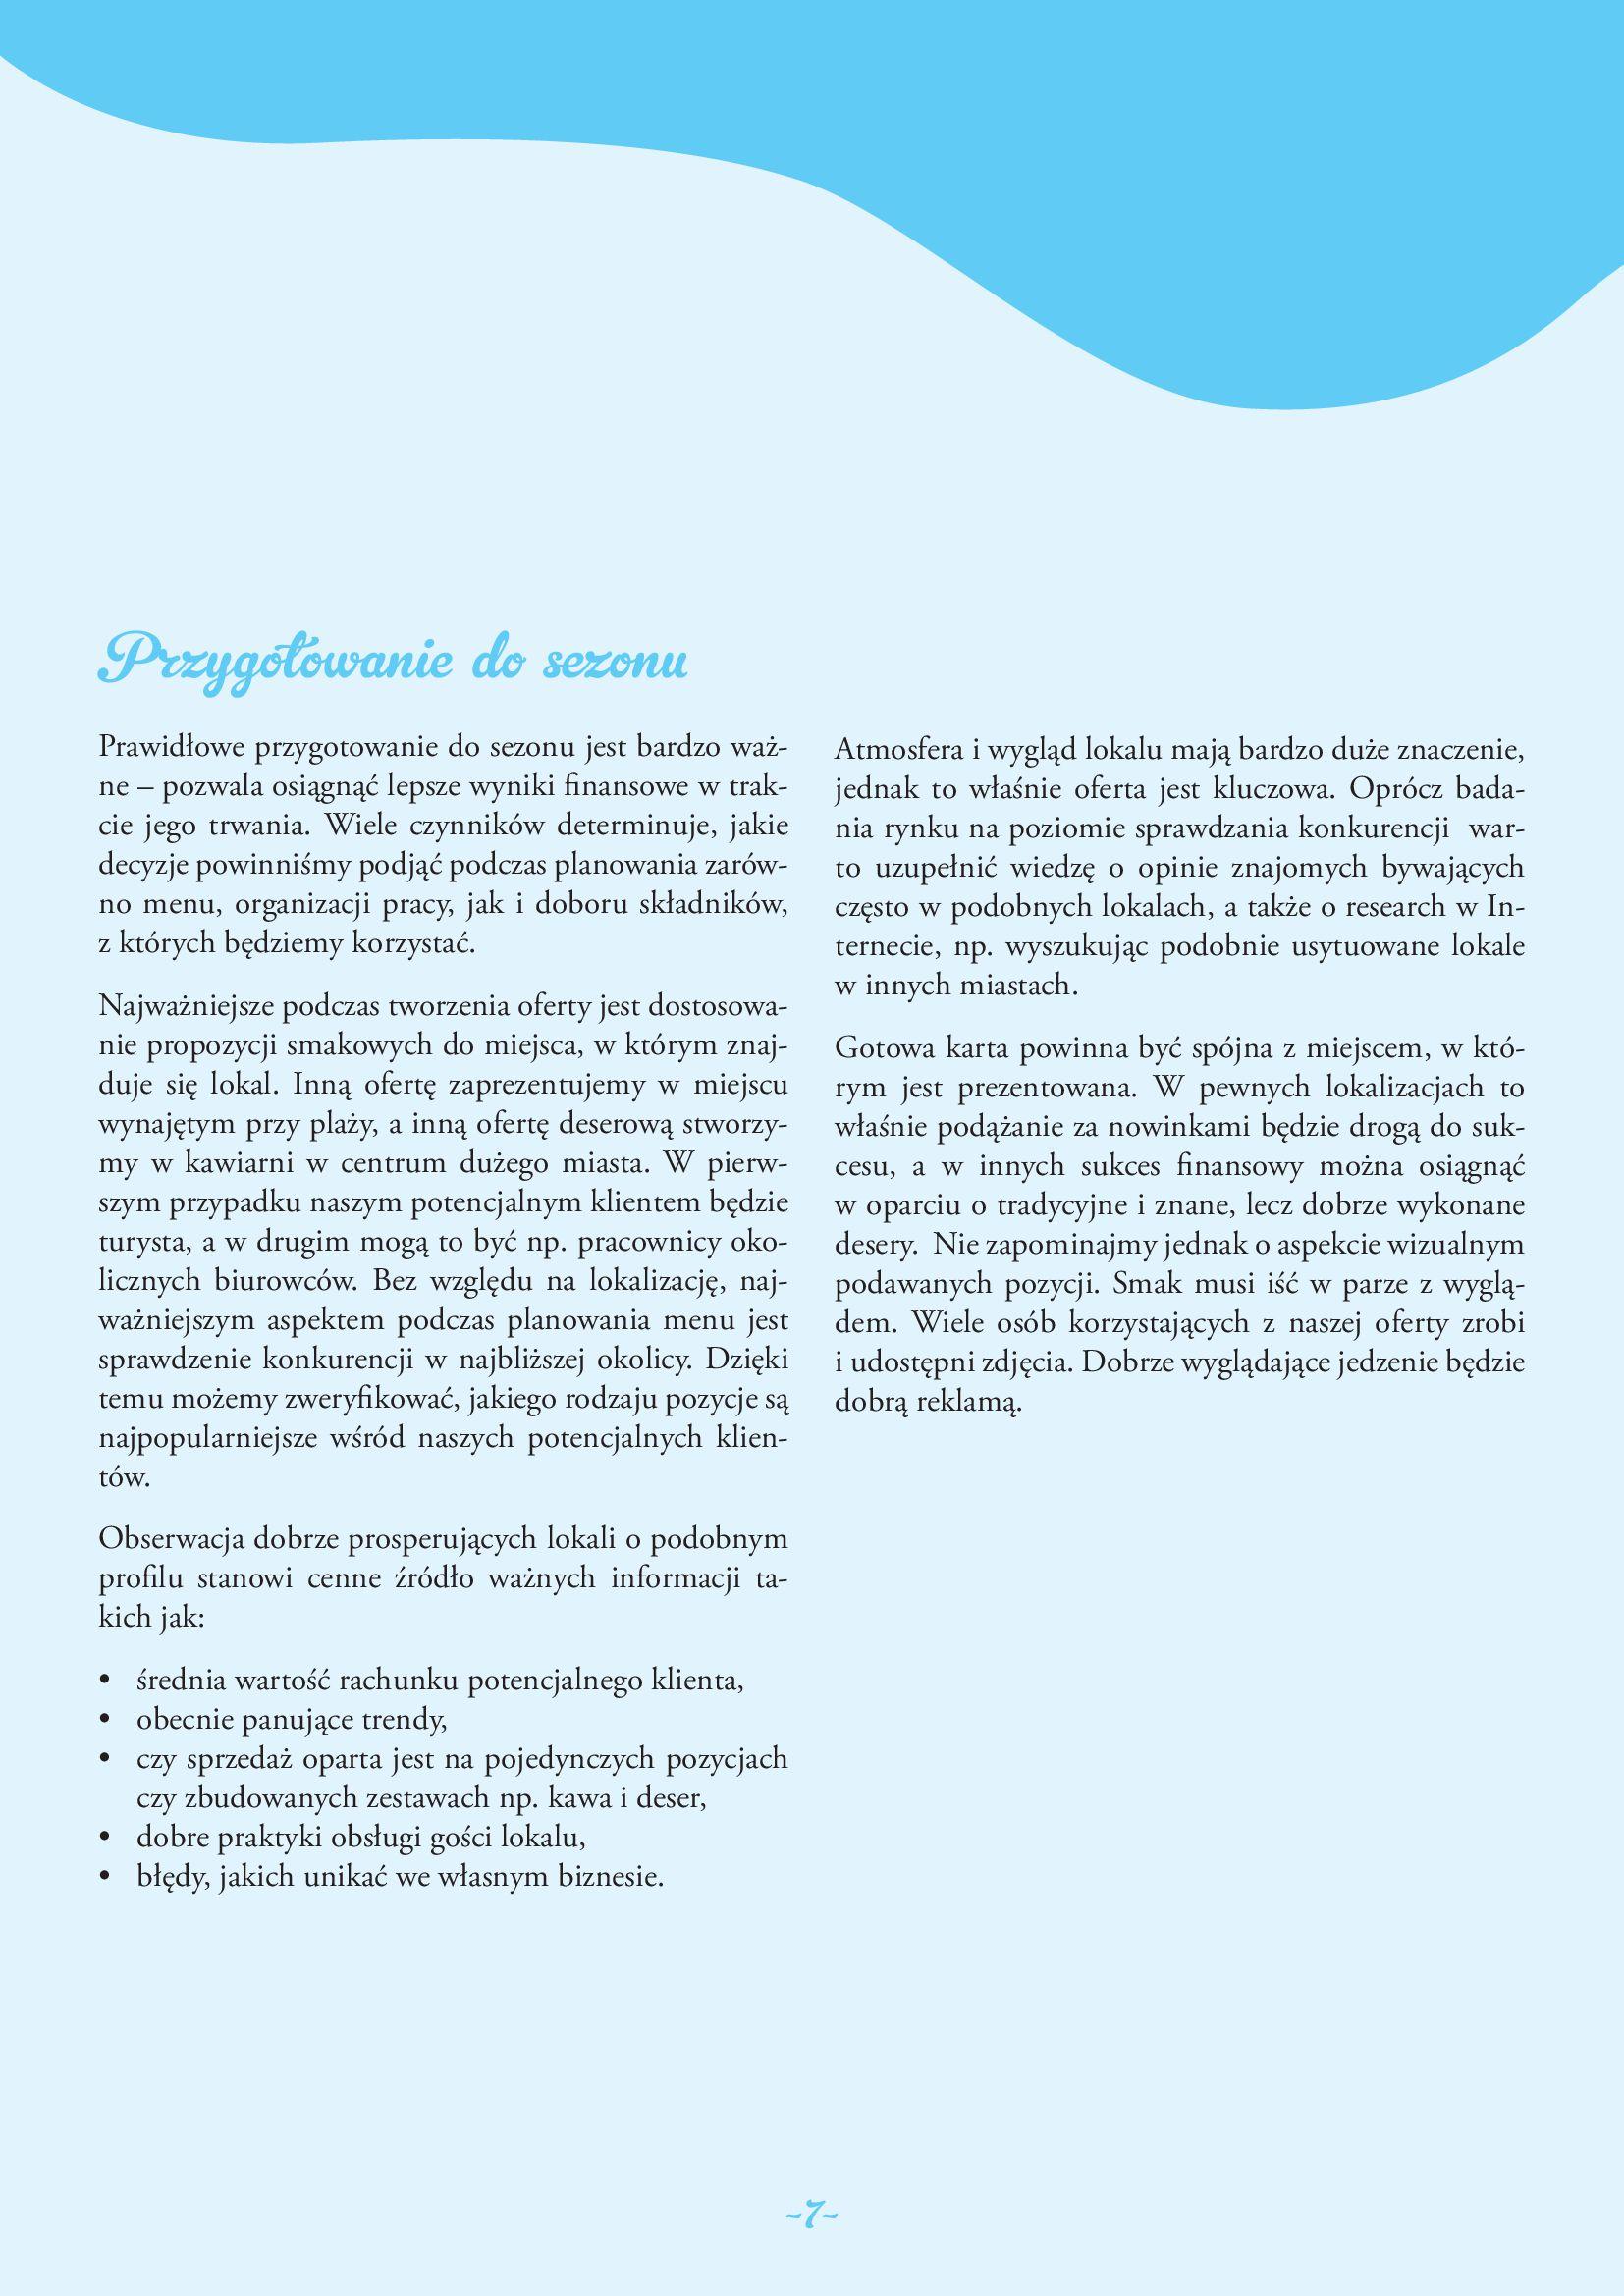 Gazetka Makro: Gazetka Makro - lody i desery 2021-05-21 page-7